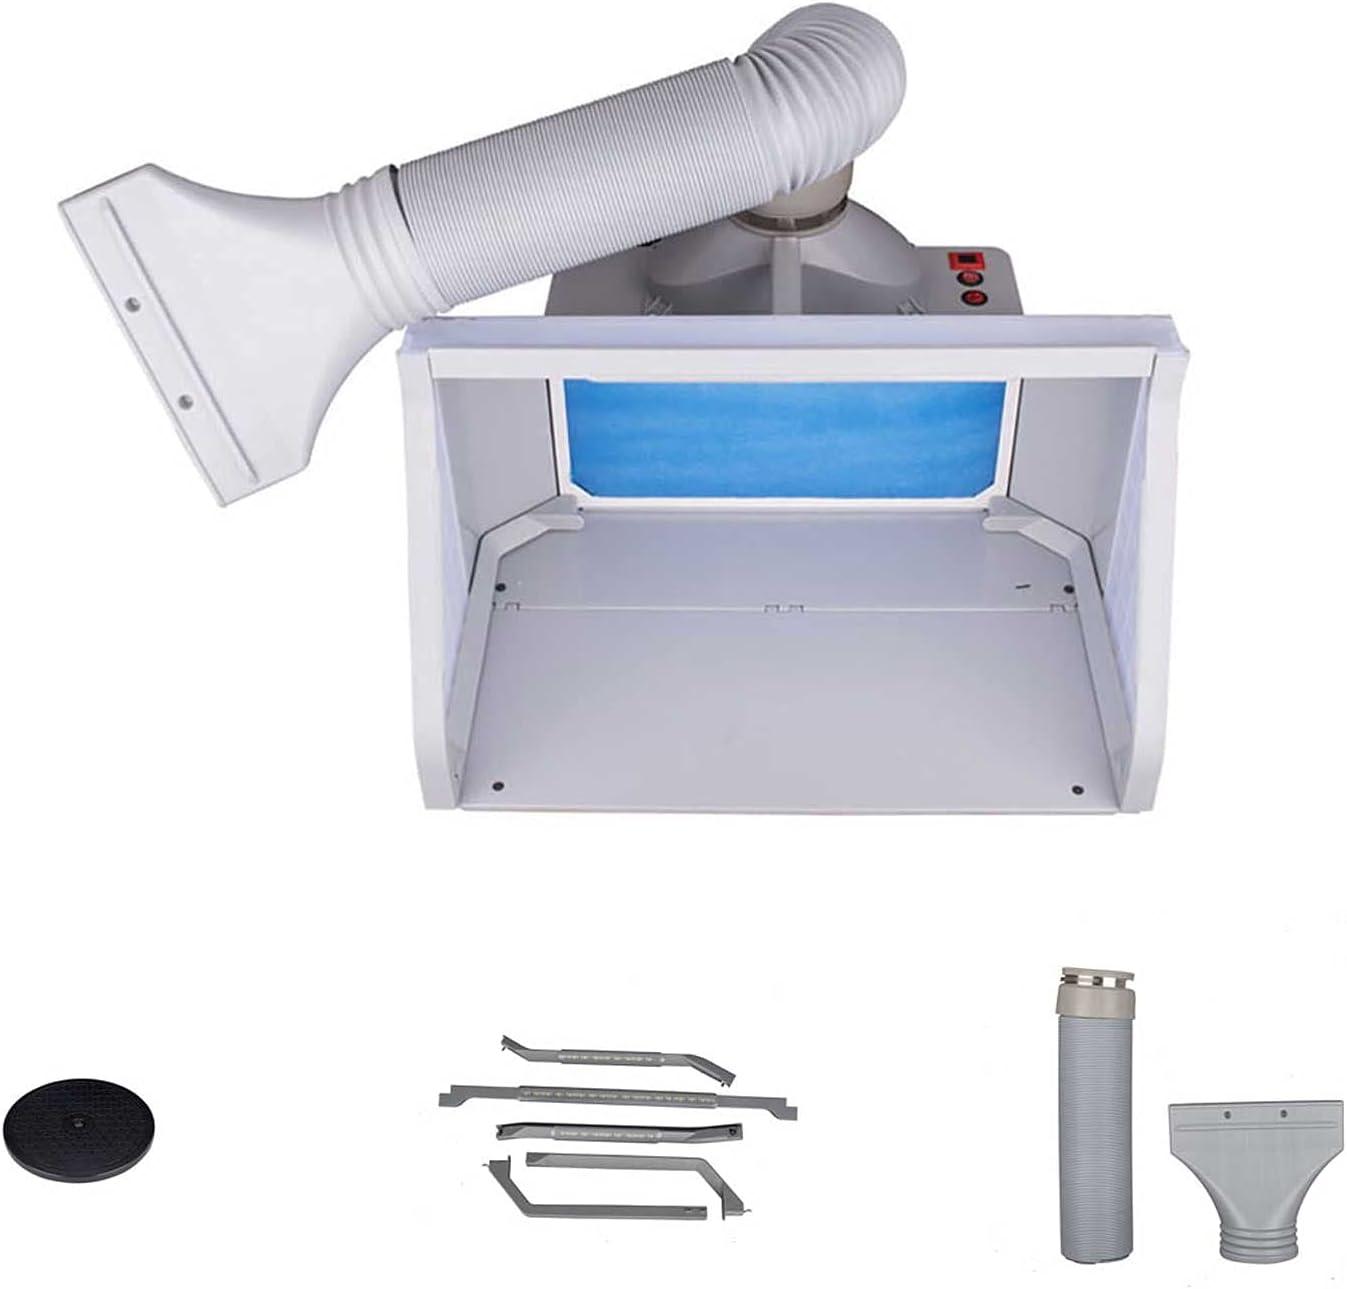 QWERTOUR Airbrush Spray Pinte Booth Kit Spray Extractor Conjunto Filtro de Escape LED Luz Interruptor Ajustable Kit de Pintura para Model Craft 100-240V